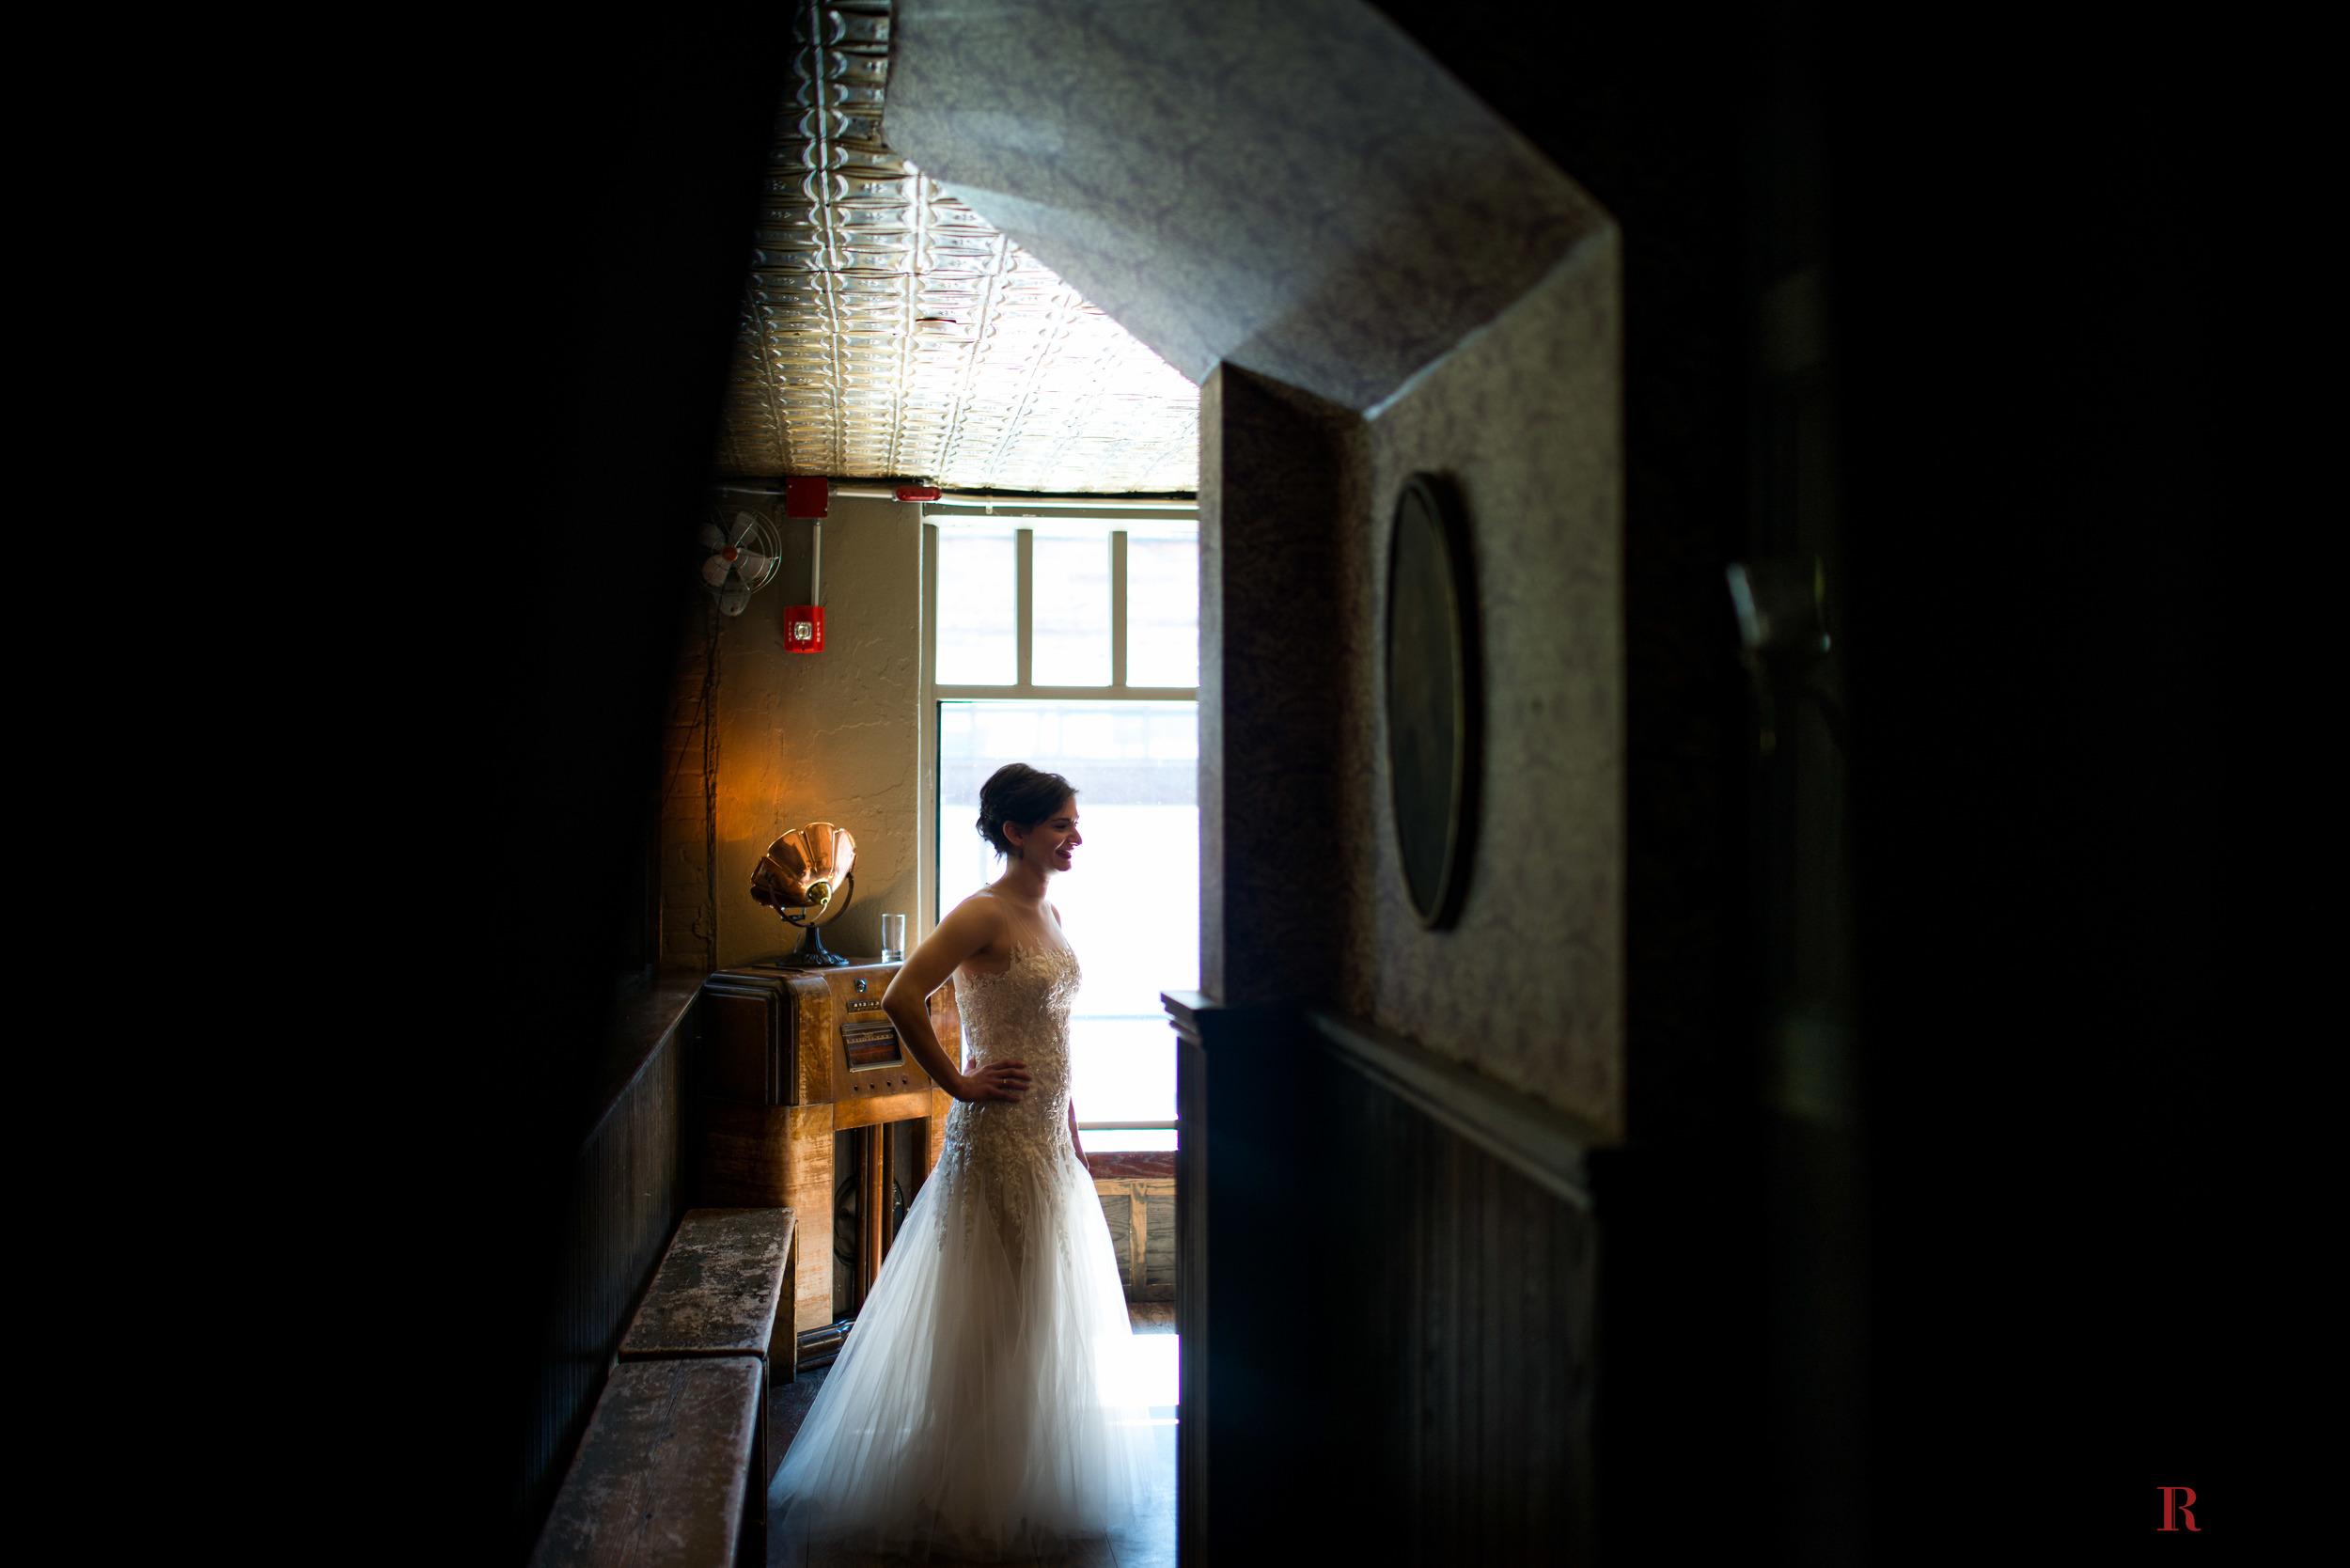 Wedding-Brooklyn-winery-allred-studio-new-york-photographer-new-jersey-hudson-valley-9695.jpg